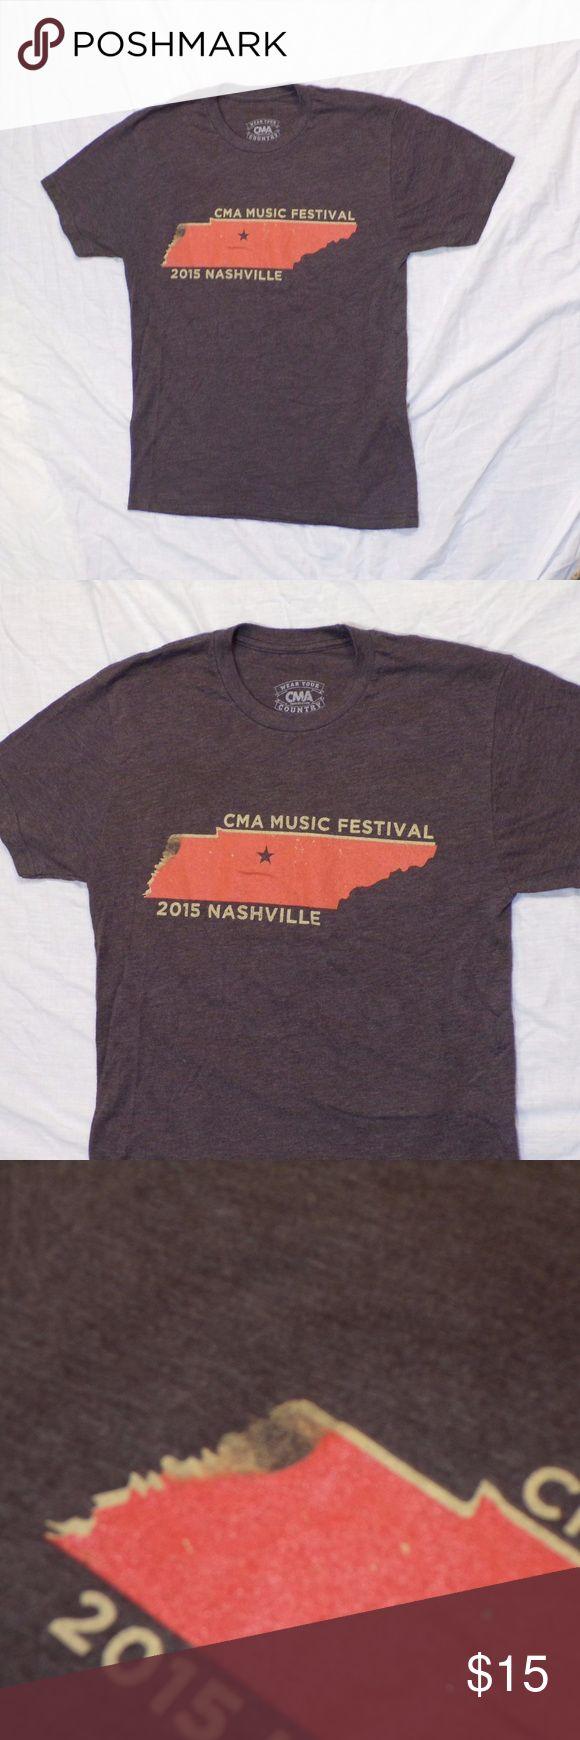 CMA Country Music Festival 2015 Tee Shirt Brown short sleeve t-shirt. From Country Music Festival Nashville in 2015. Orange Tennessee shape. Vintage like print. GUC. Pet Friendly + Smoke Free Home. Tops Tees - Short Sleeve